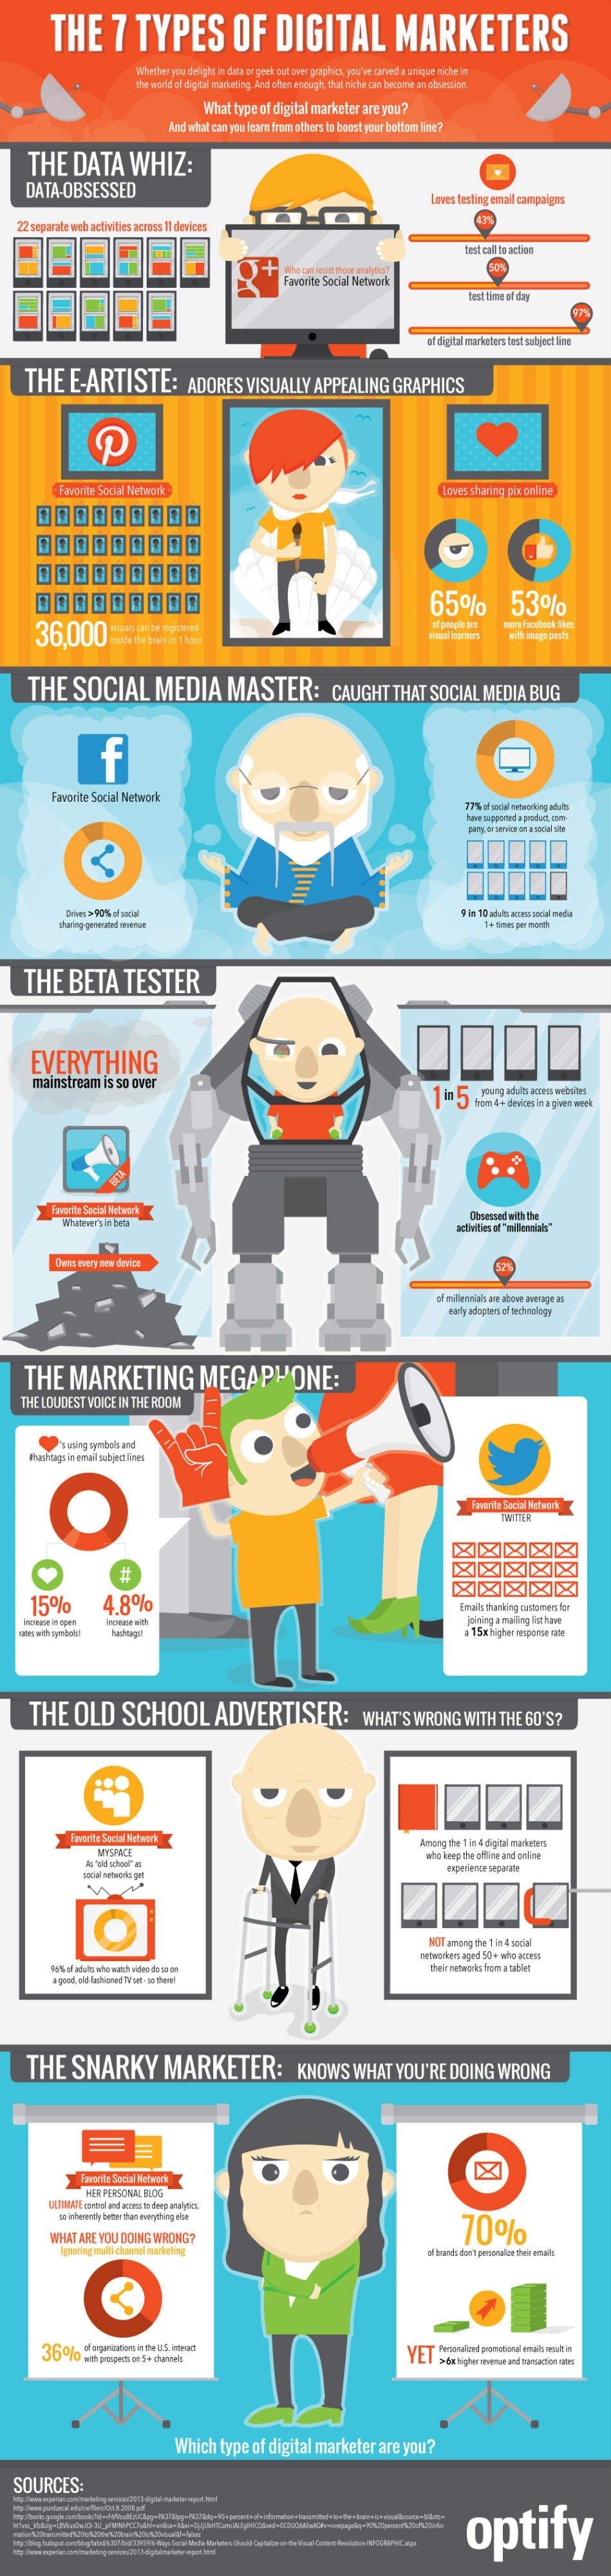 7 Types of Digital Marketers